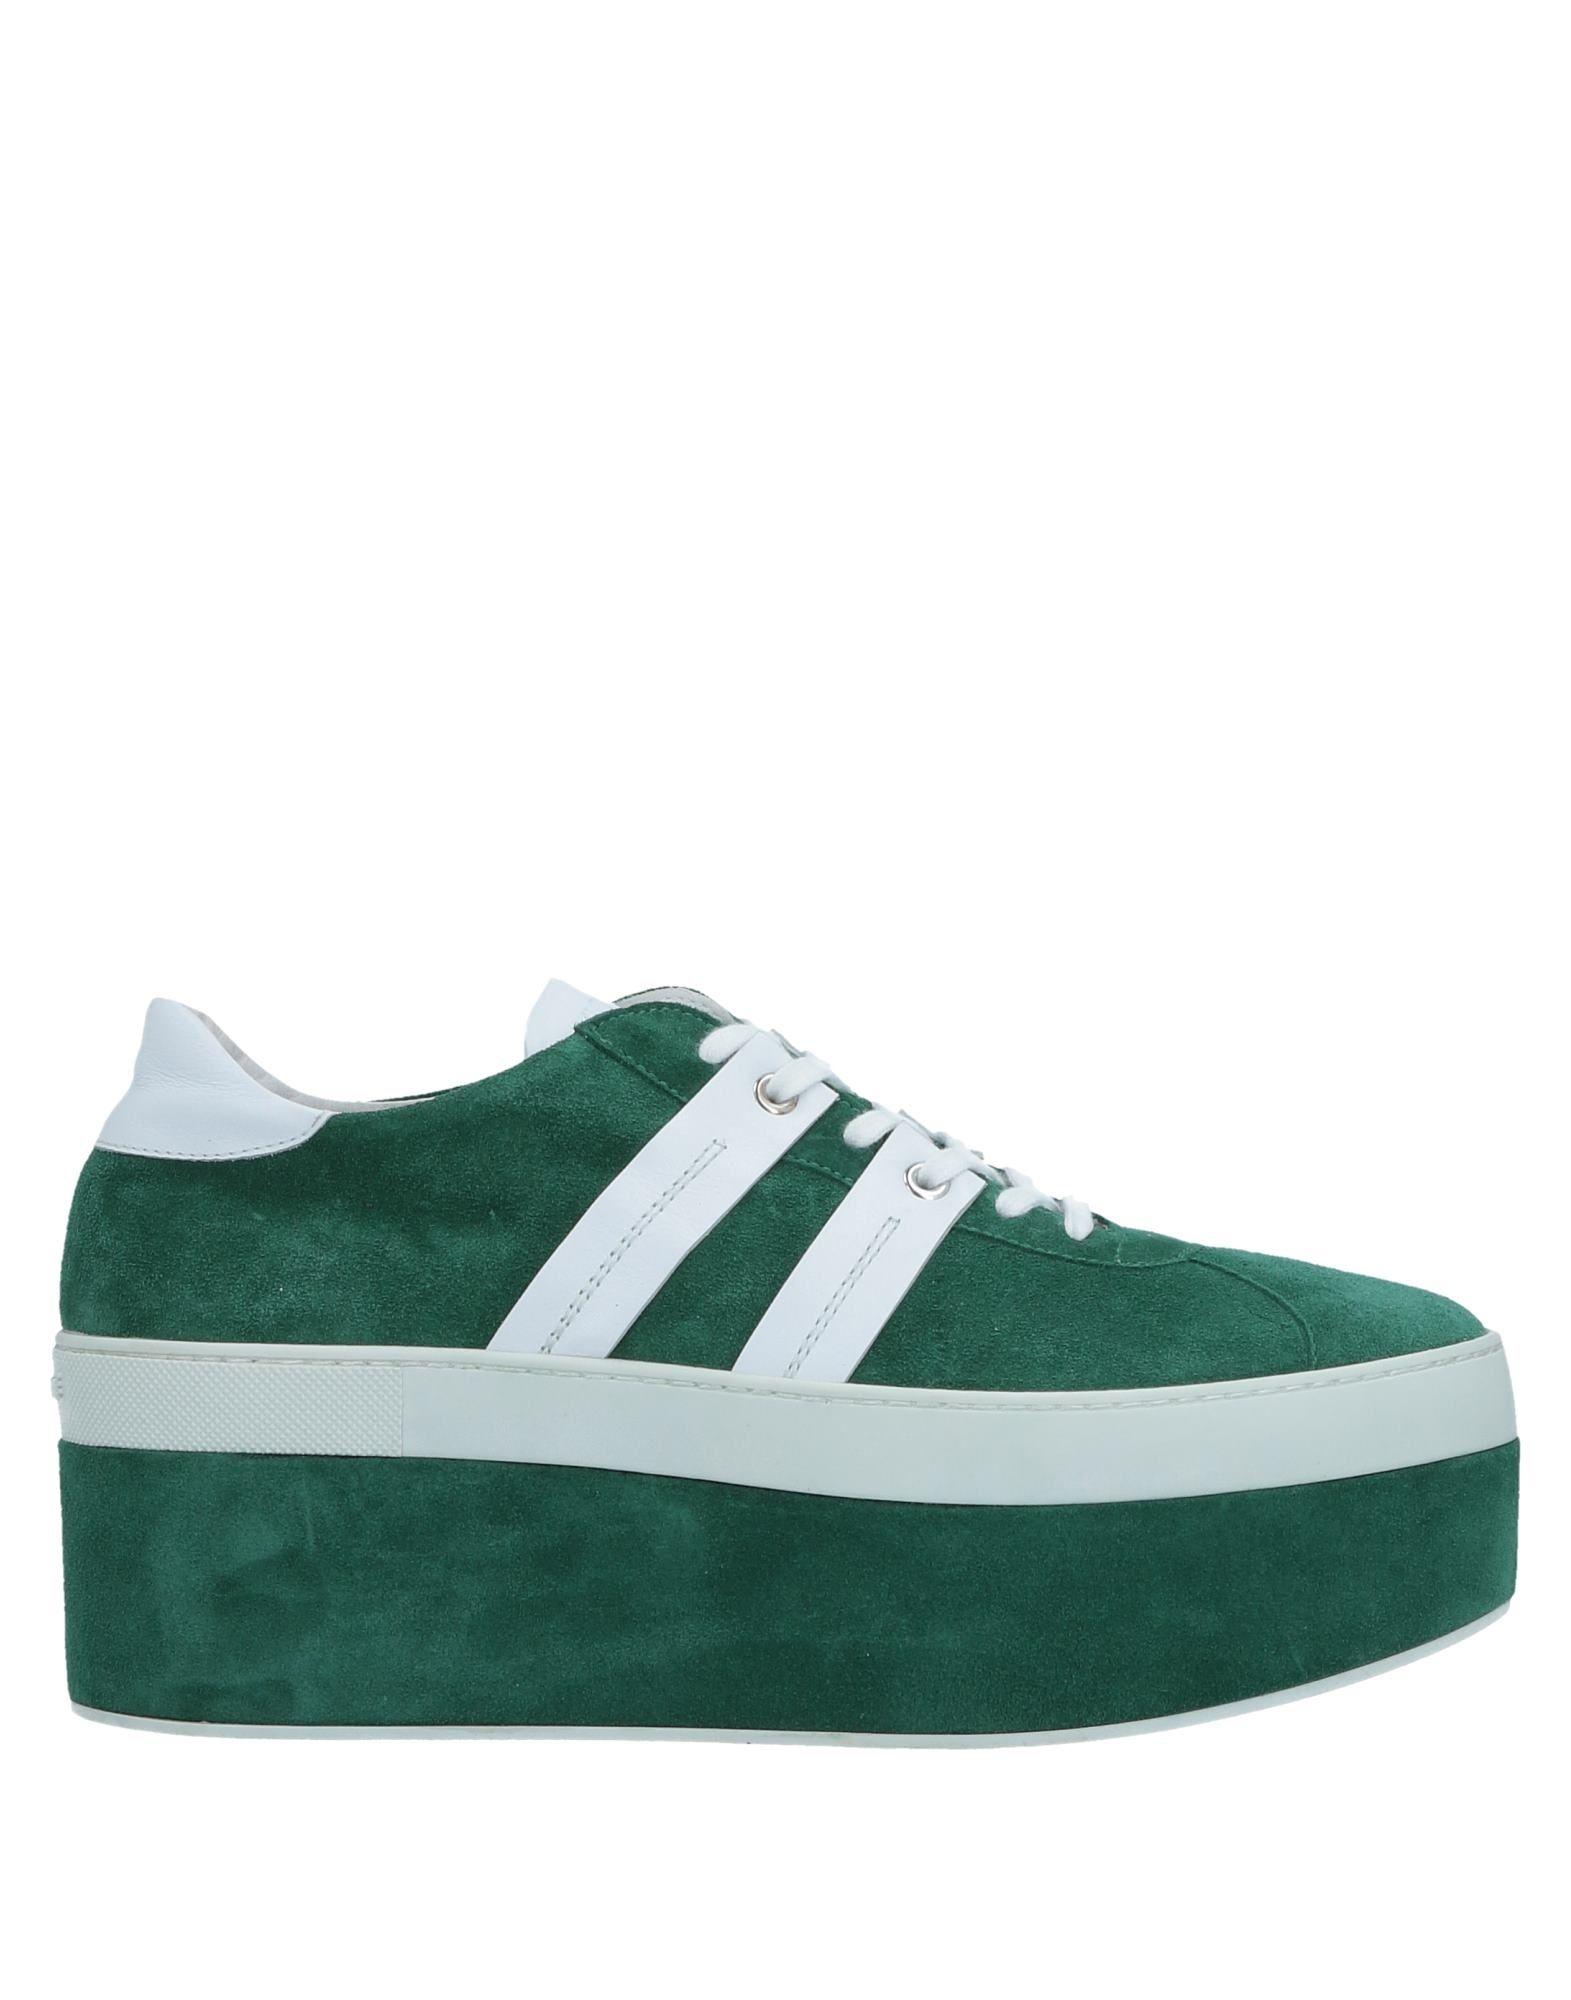 Vic Matiē Sneakers Damen  11459652TEGut aussehende strapazierfähige Schuhe